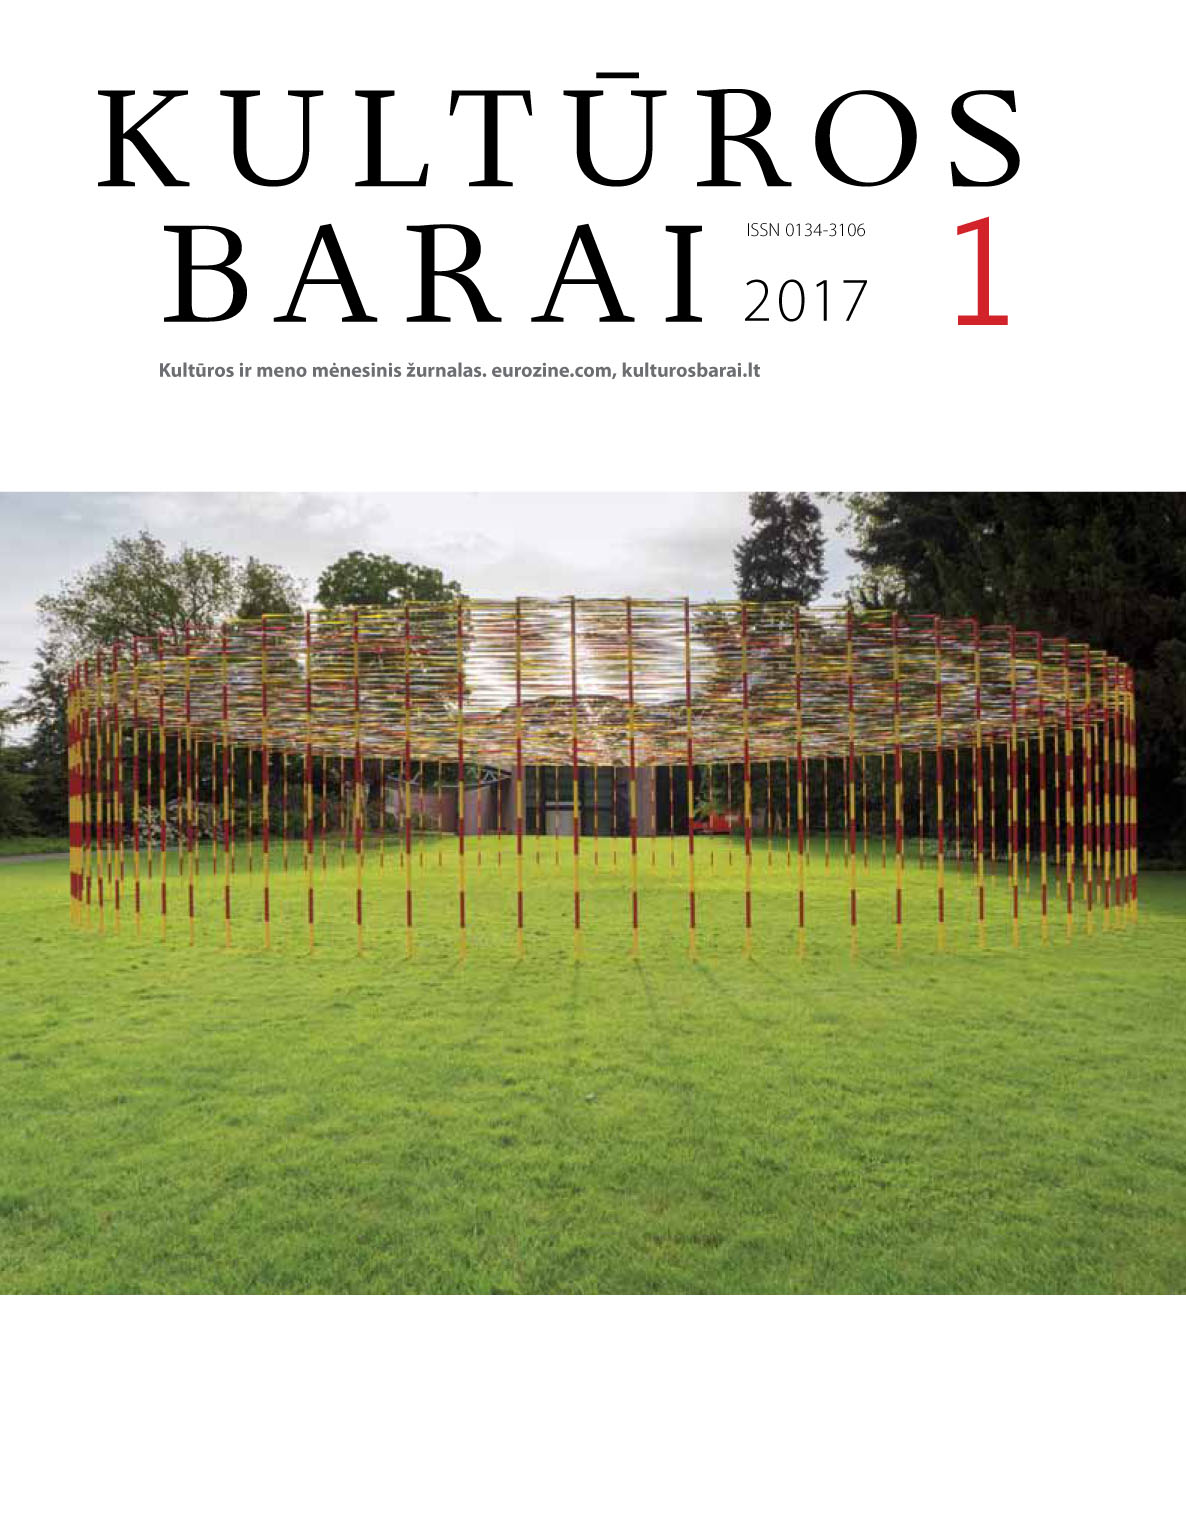 kulturos barai cover 1 2017